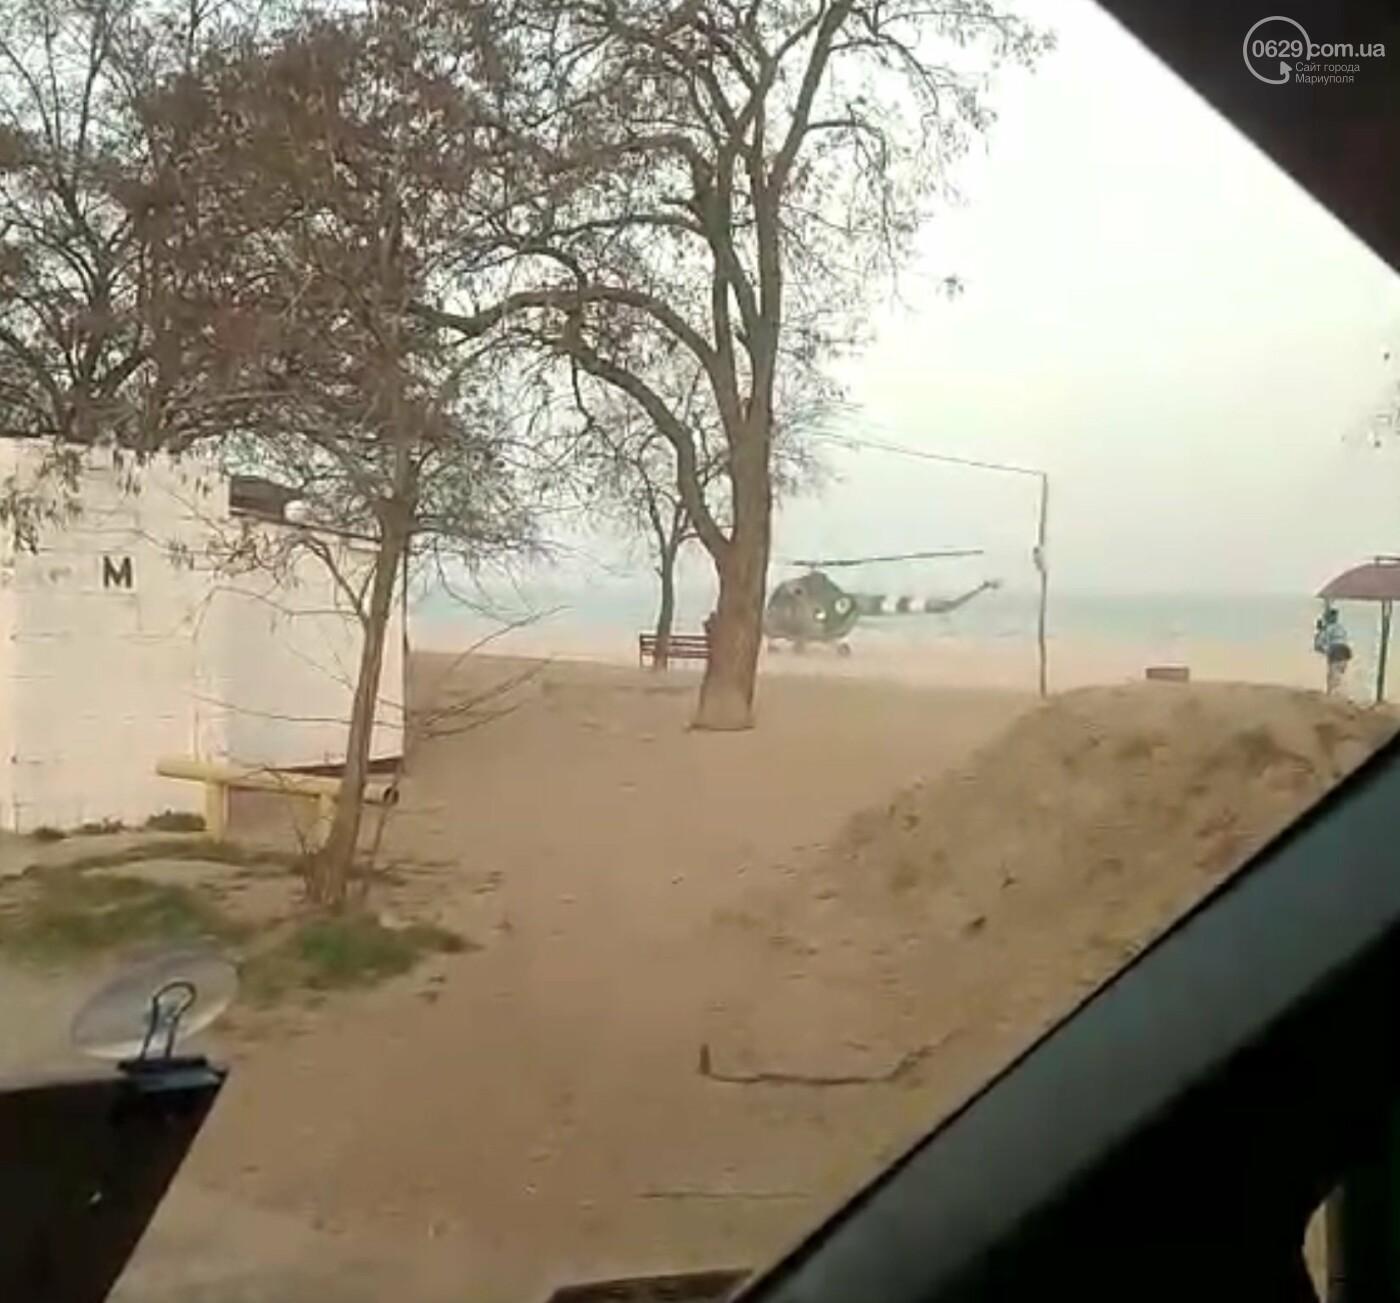 На пляже посёлка Песчаный сел вертолёт, - ВИДЕО, фото-1